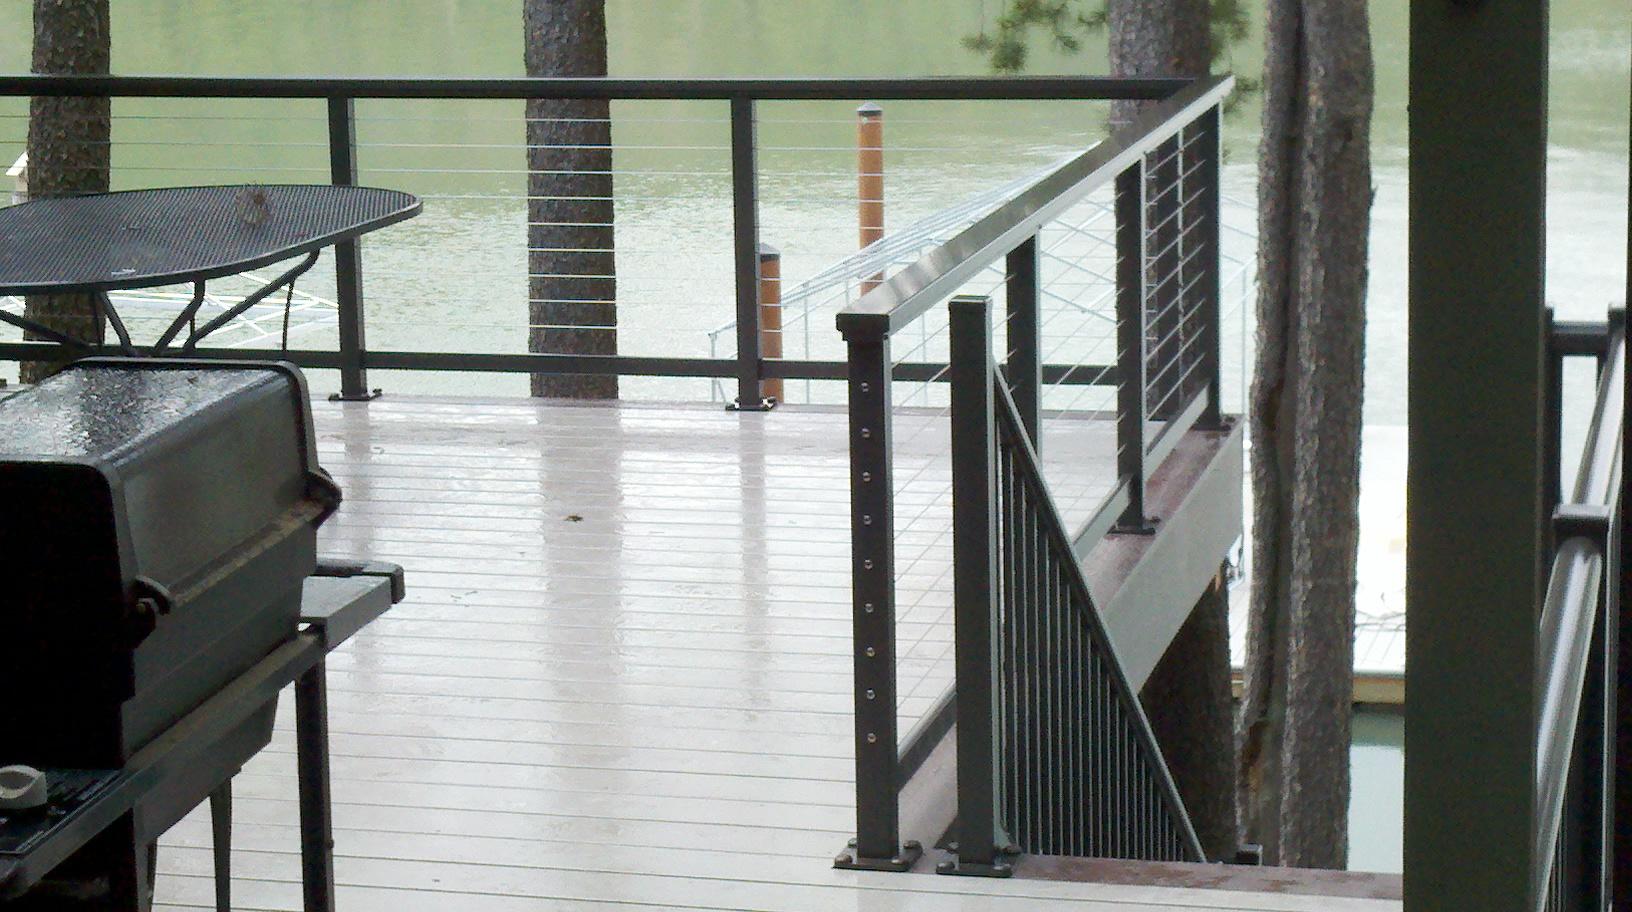 Balcony railing design french balcony modern balcony handrail ideas - Build Hog Wire Deck Railing 187 Design And Ideas